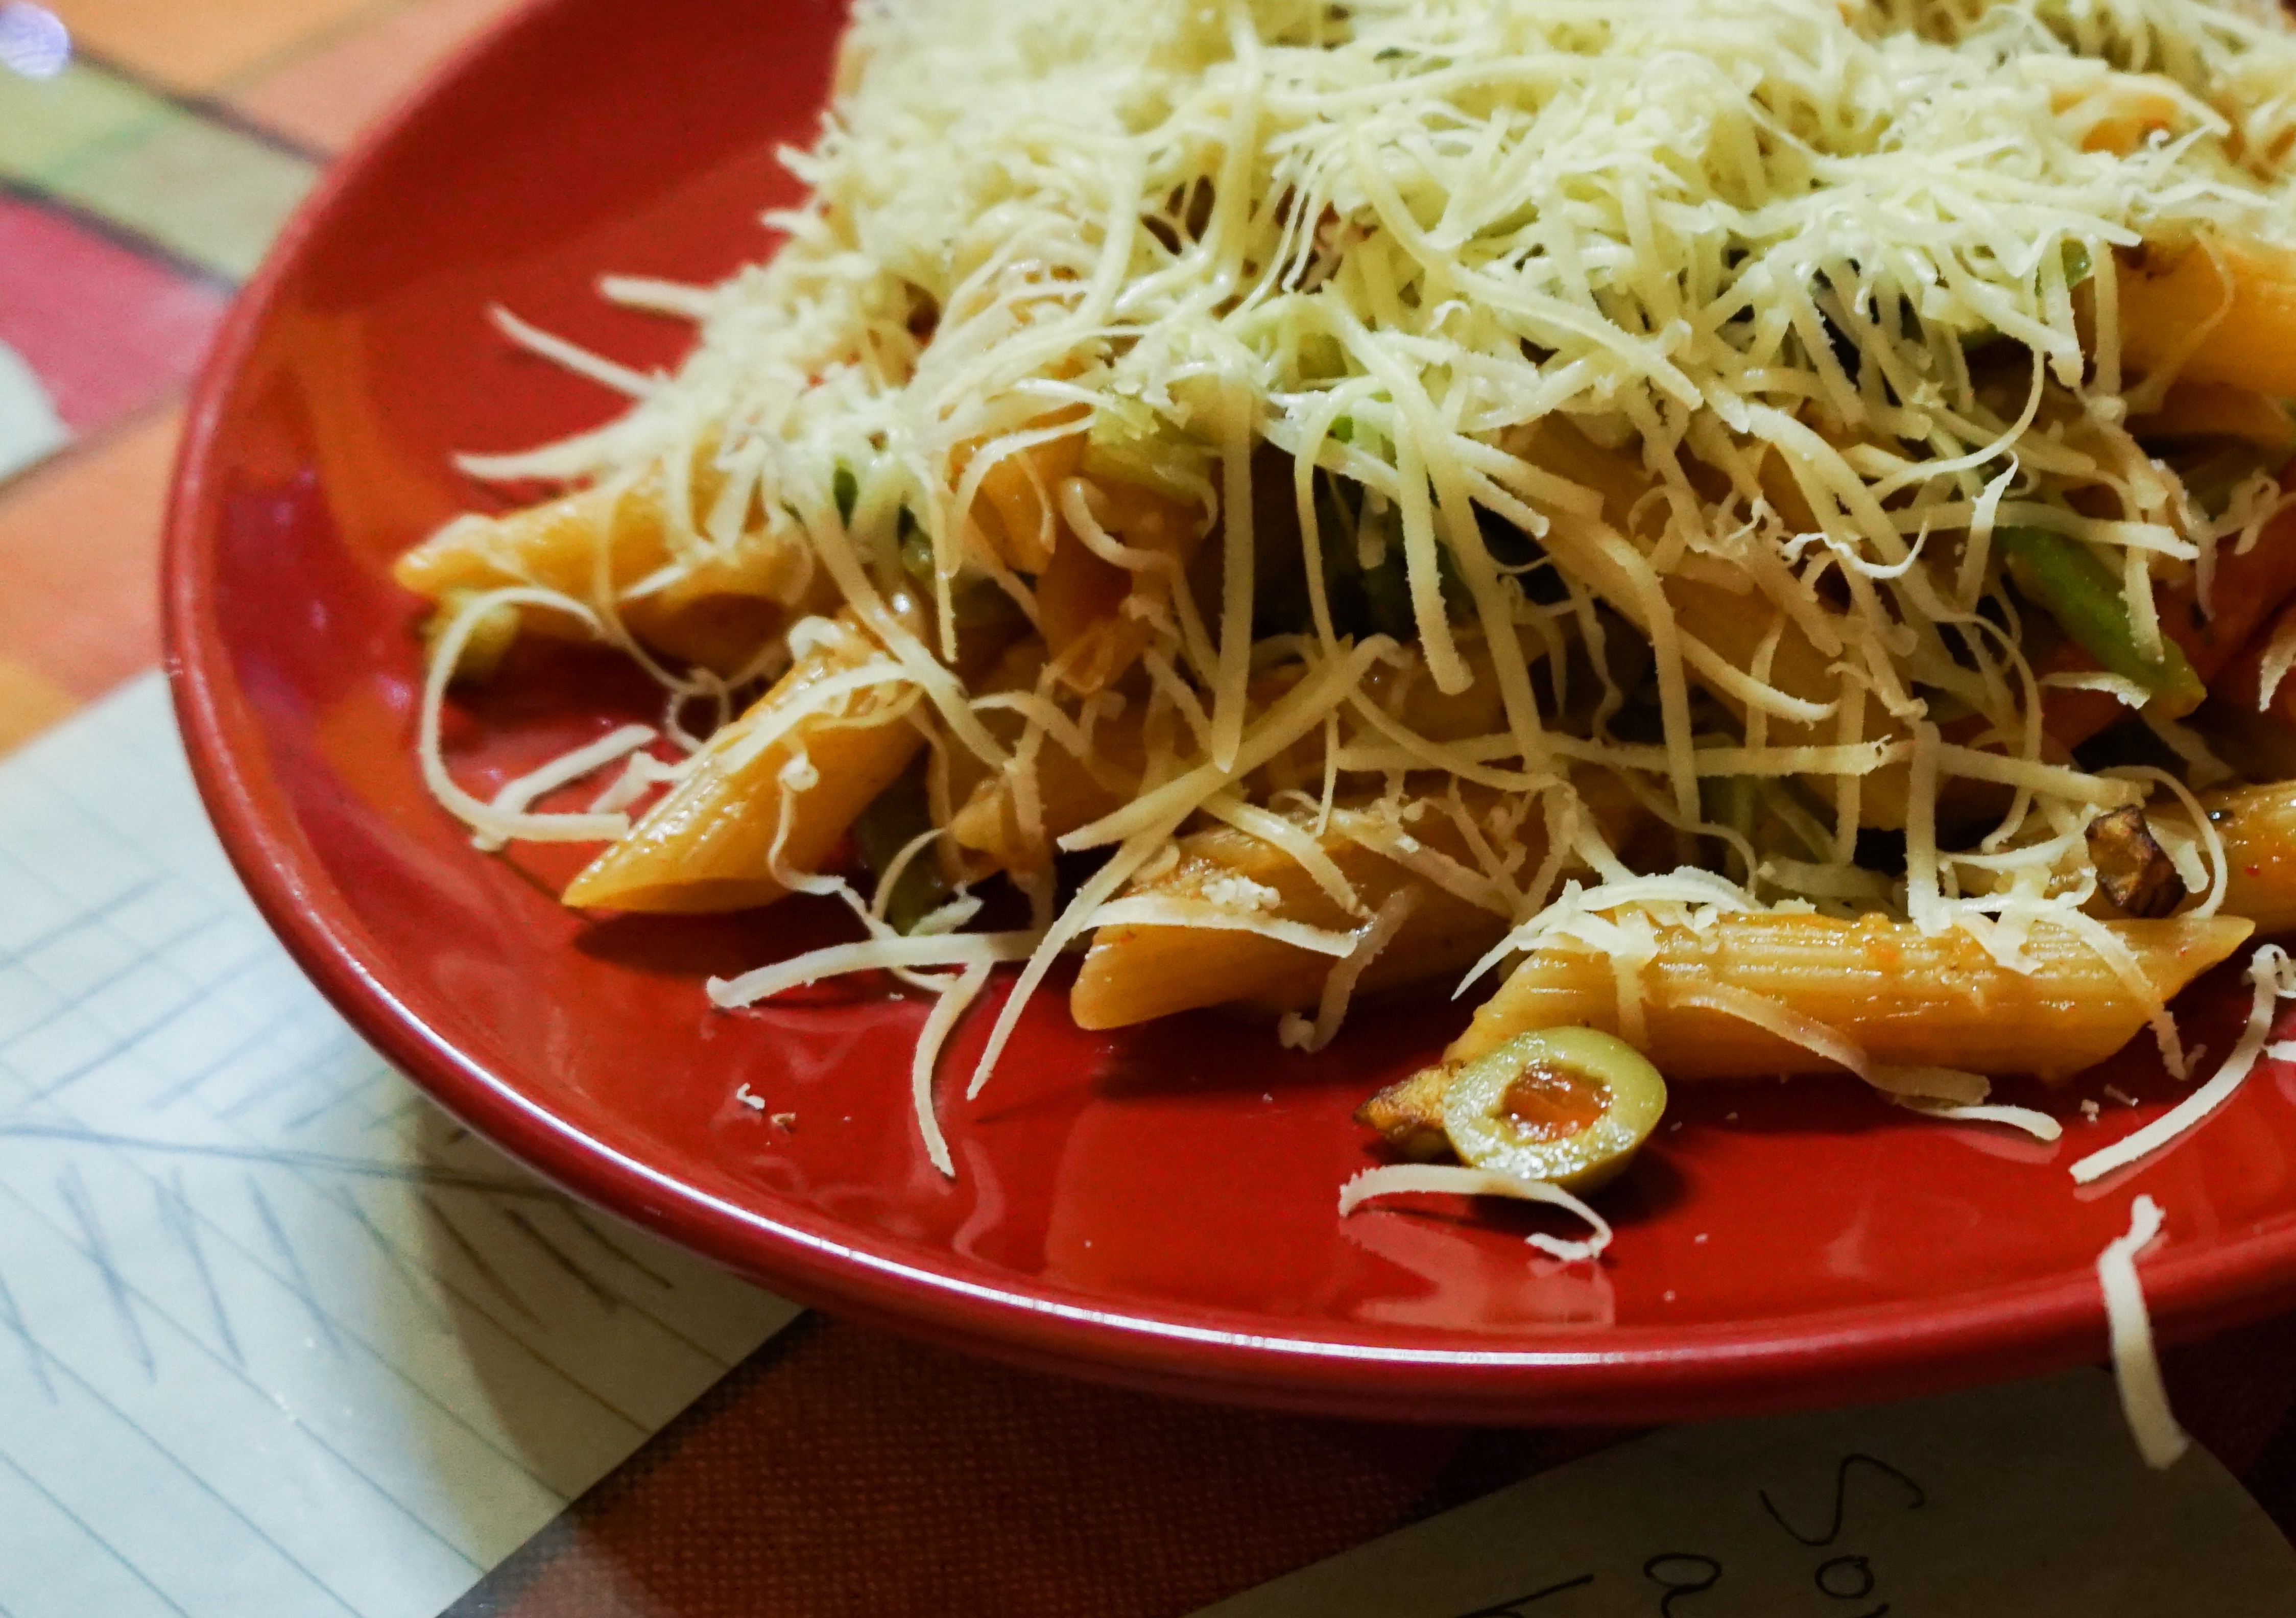 FileVeg Pasta In Red Sauce